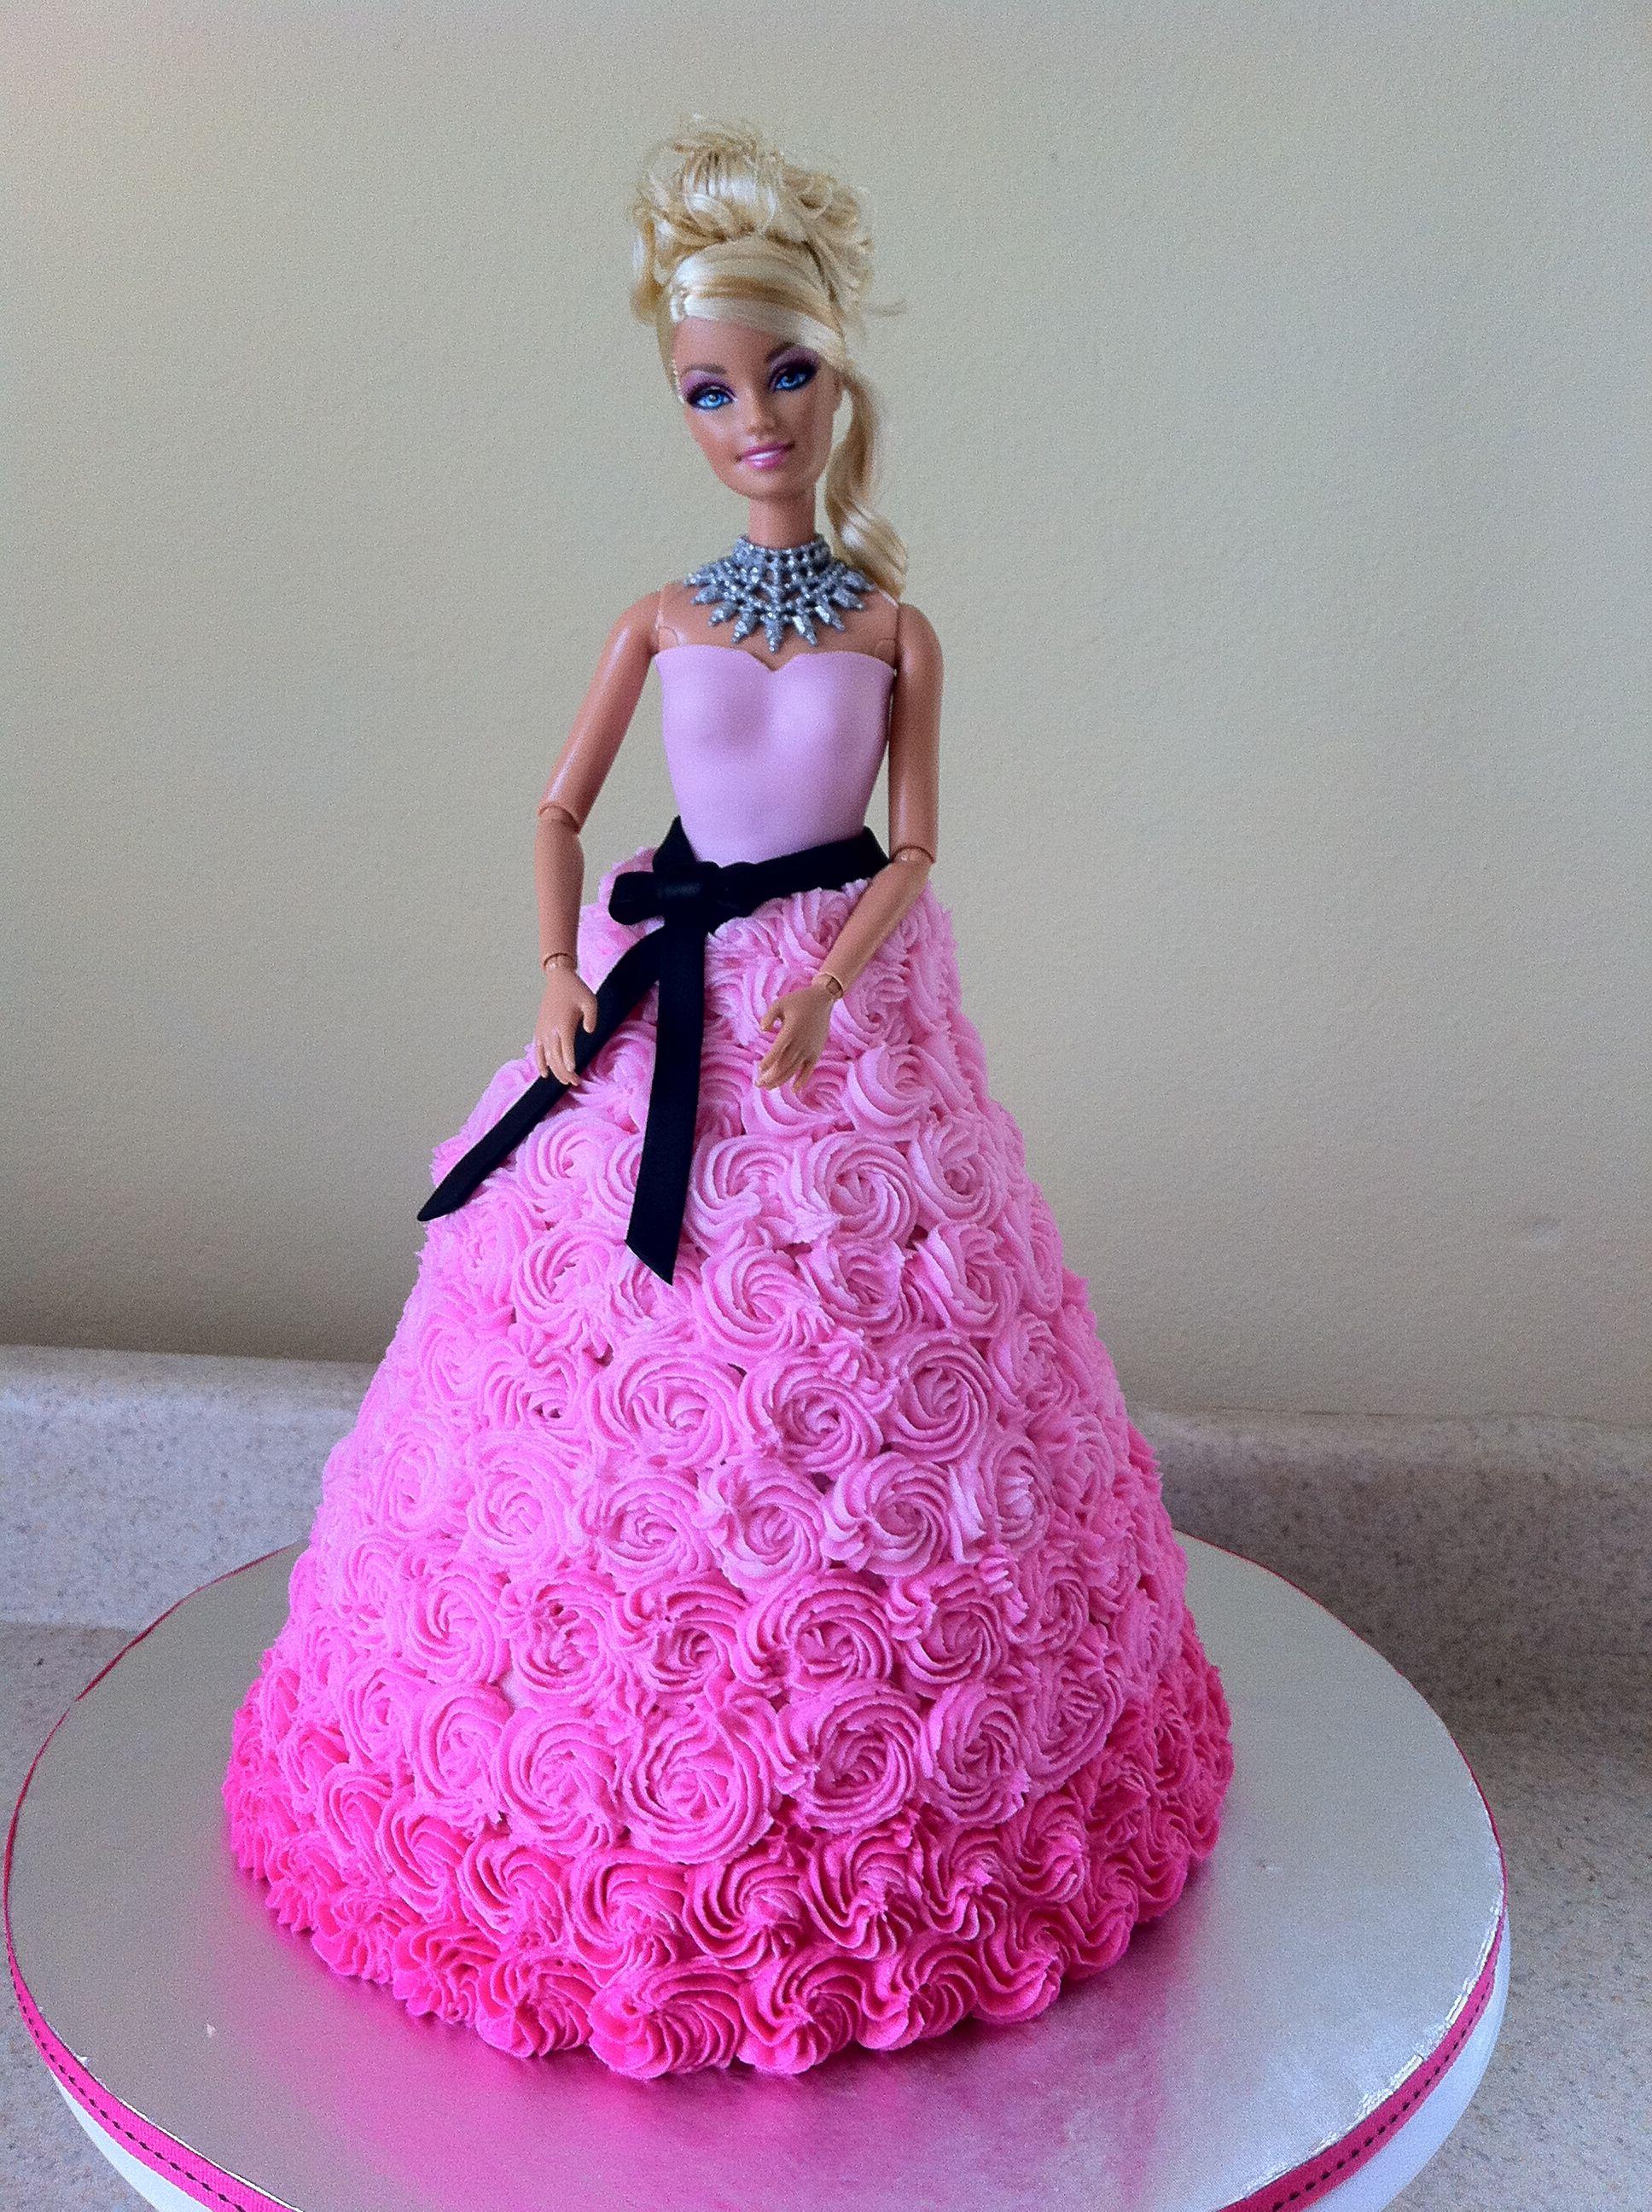 Торт кукла Барби из крема мастеркласс торта Принцесса